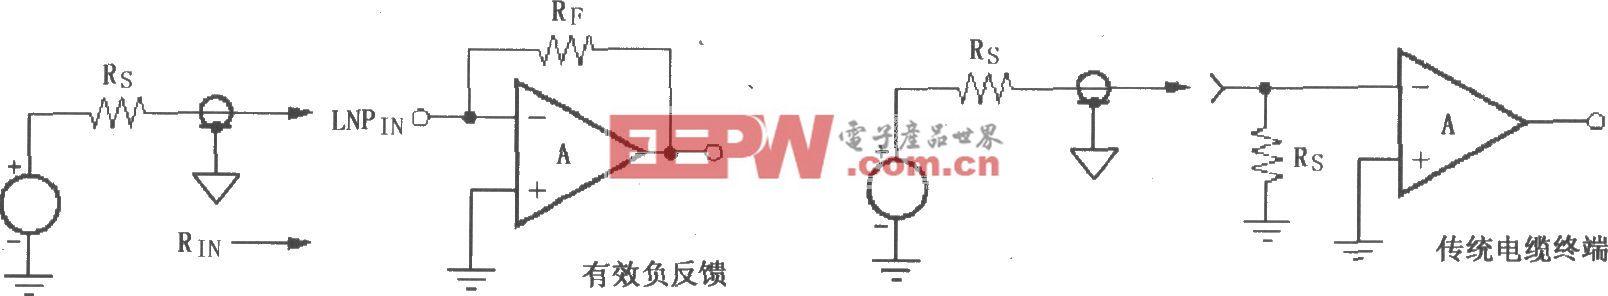 VCA2612/2613/2616有效負反饋和傳統電纜終端結構電路